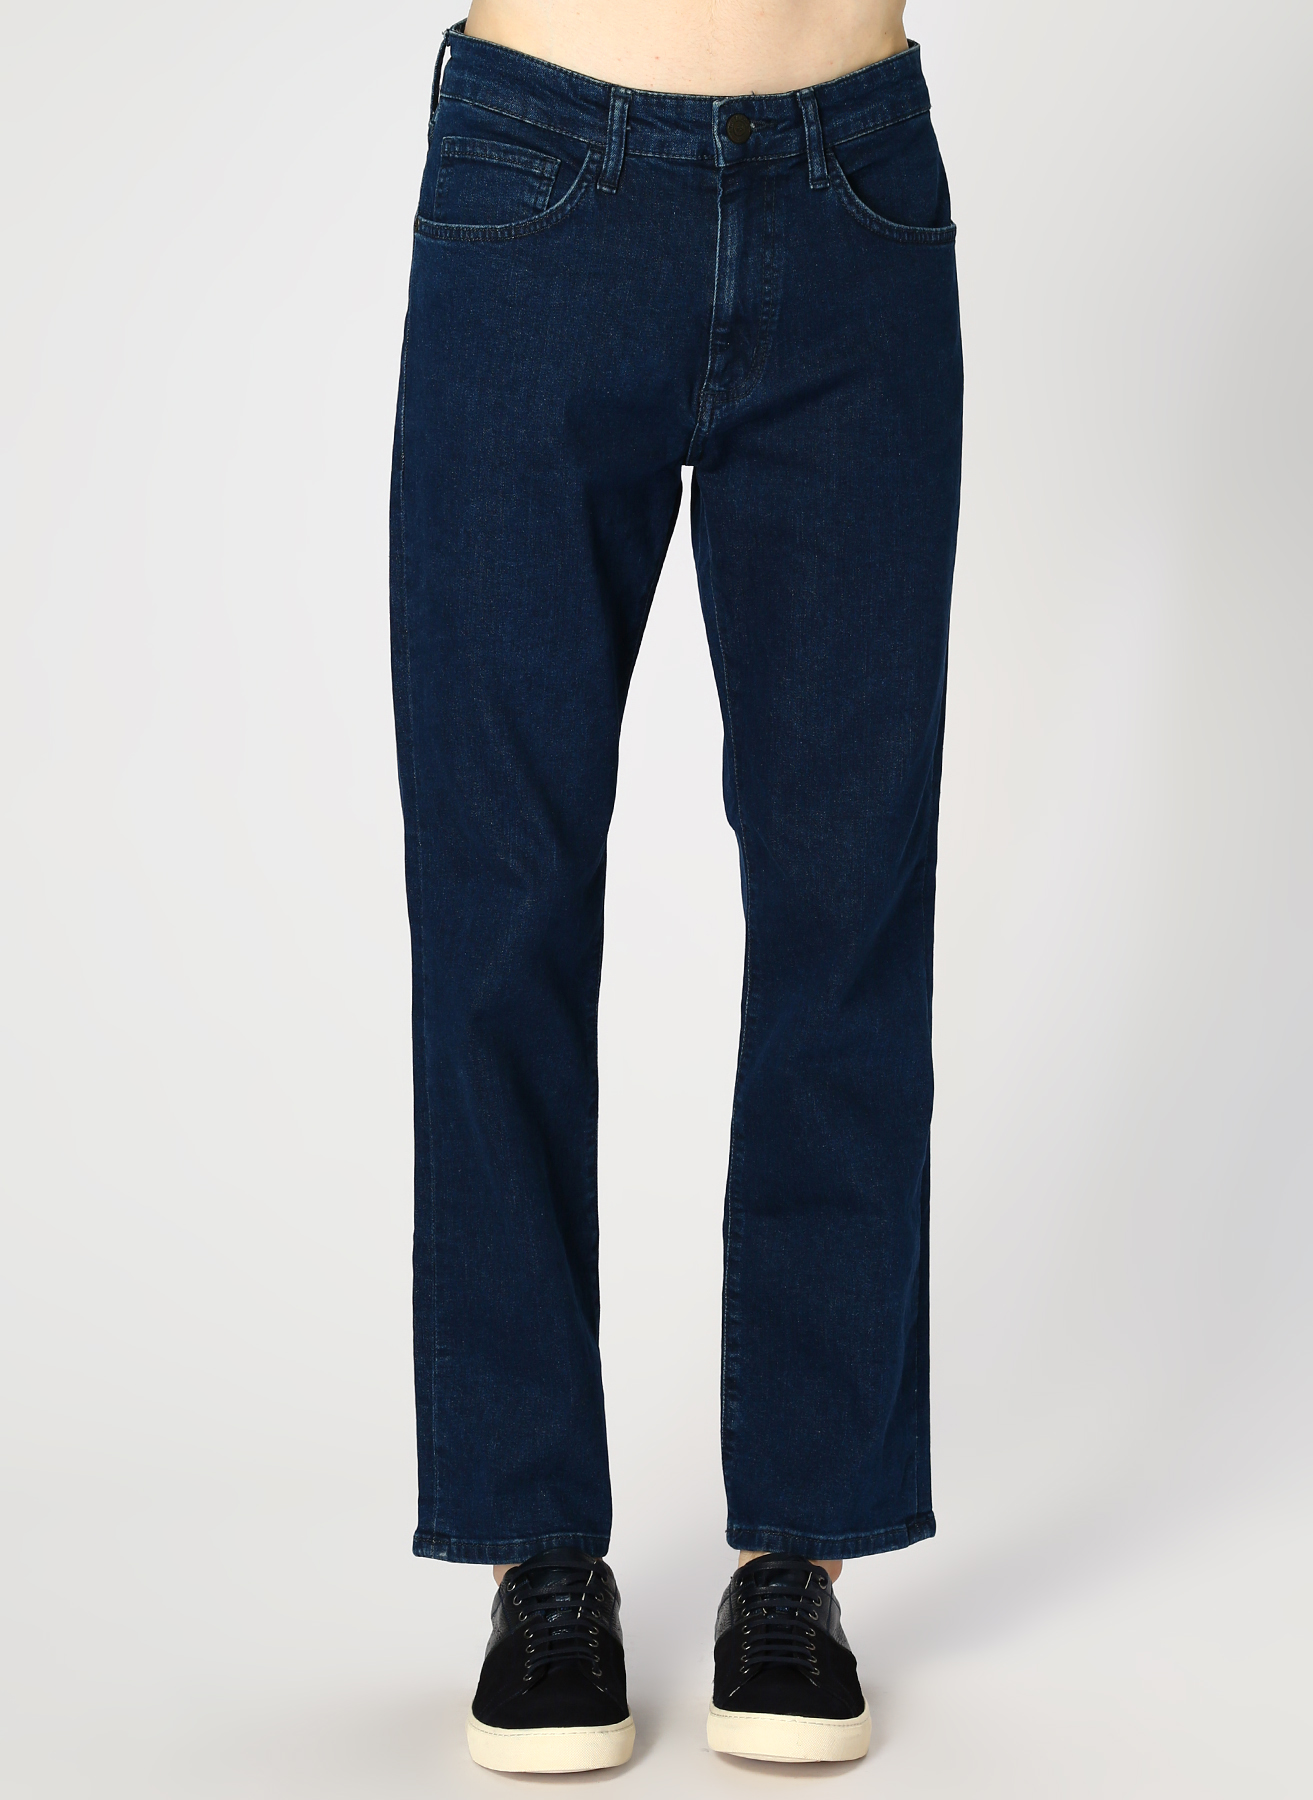 Mavi Klasik Pantolon 33-34 5001634306017 Ürün Resmi